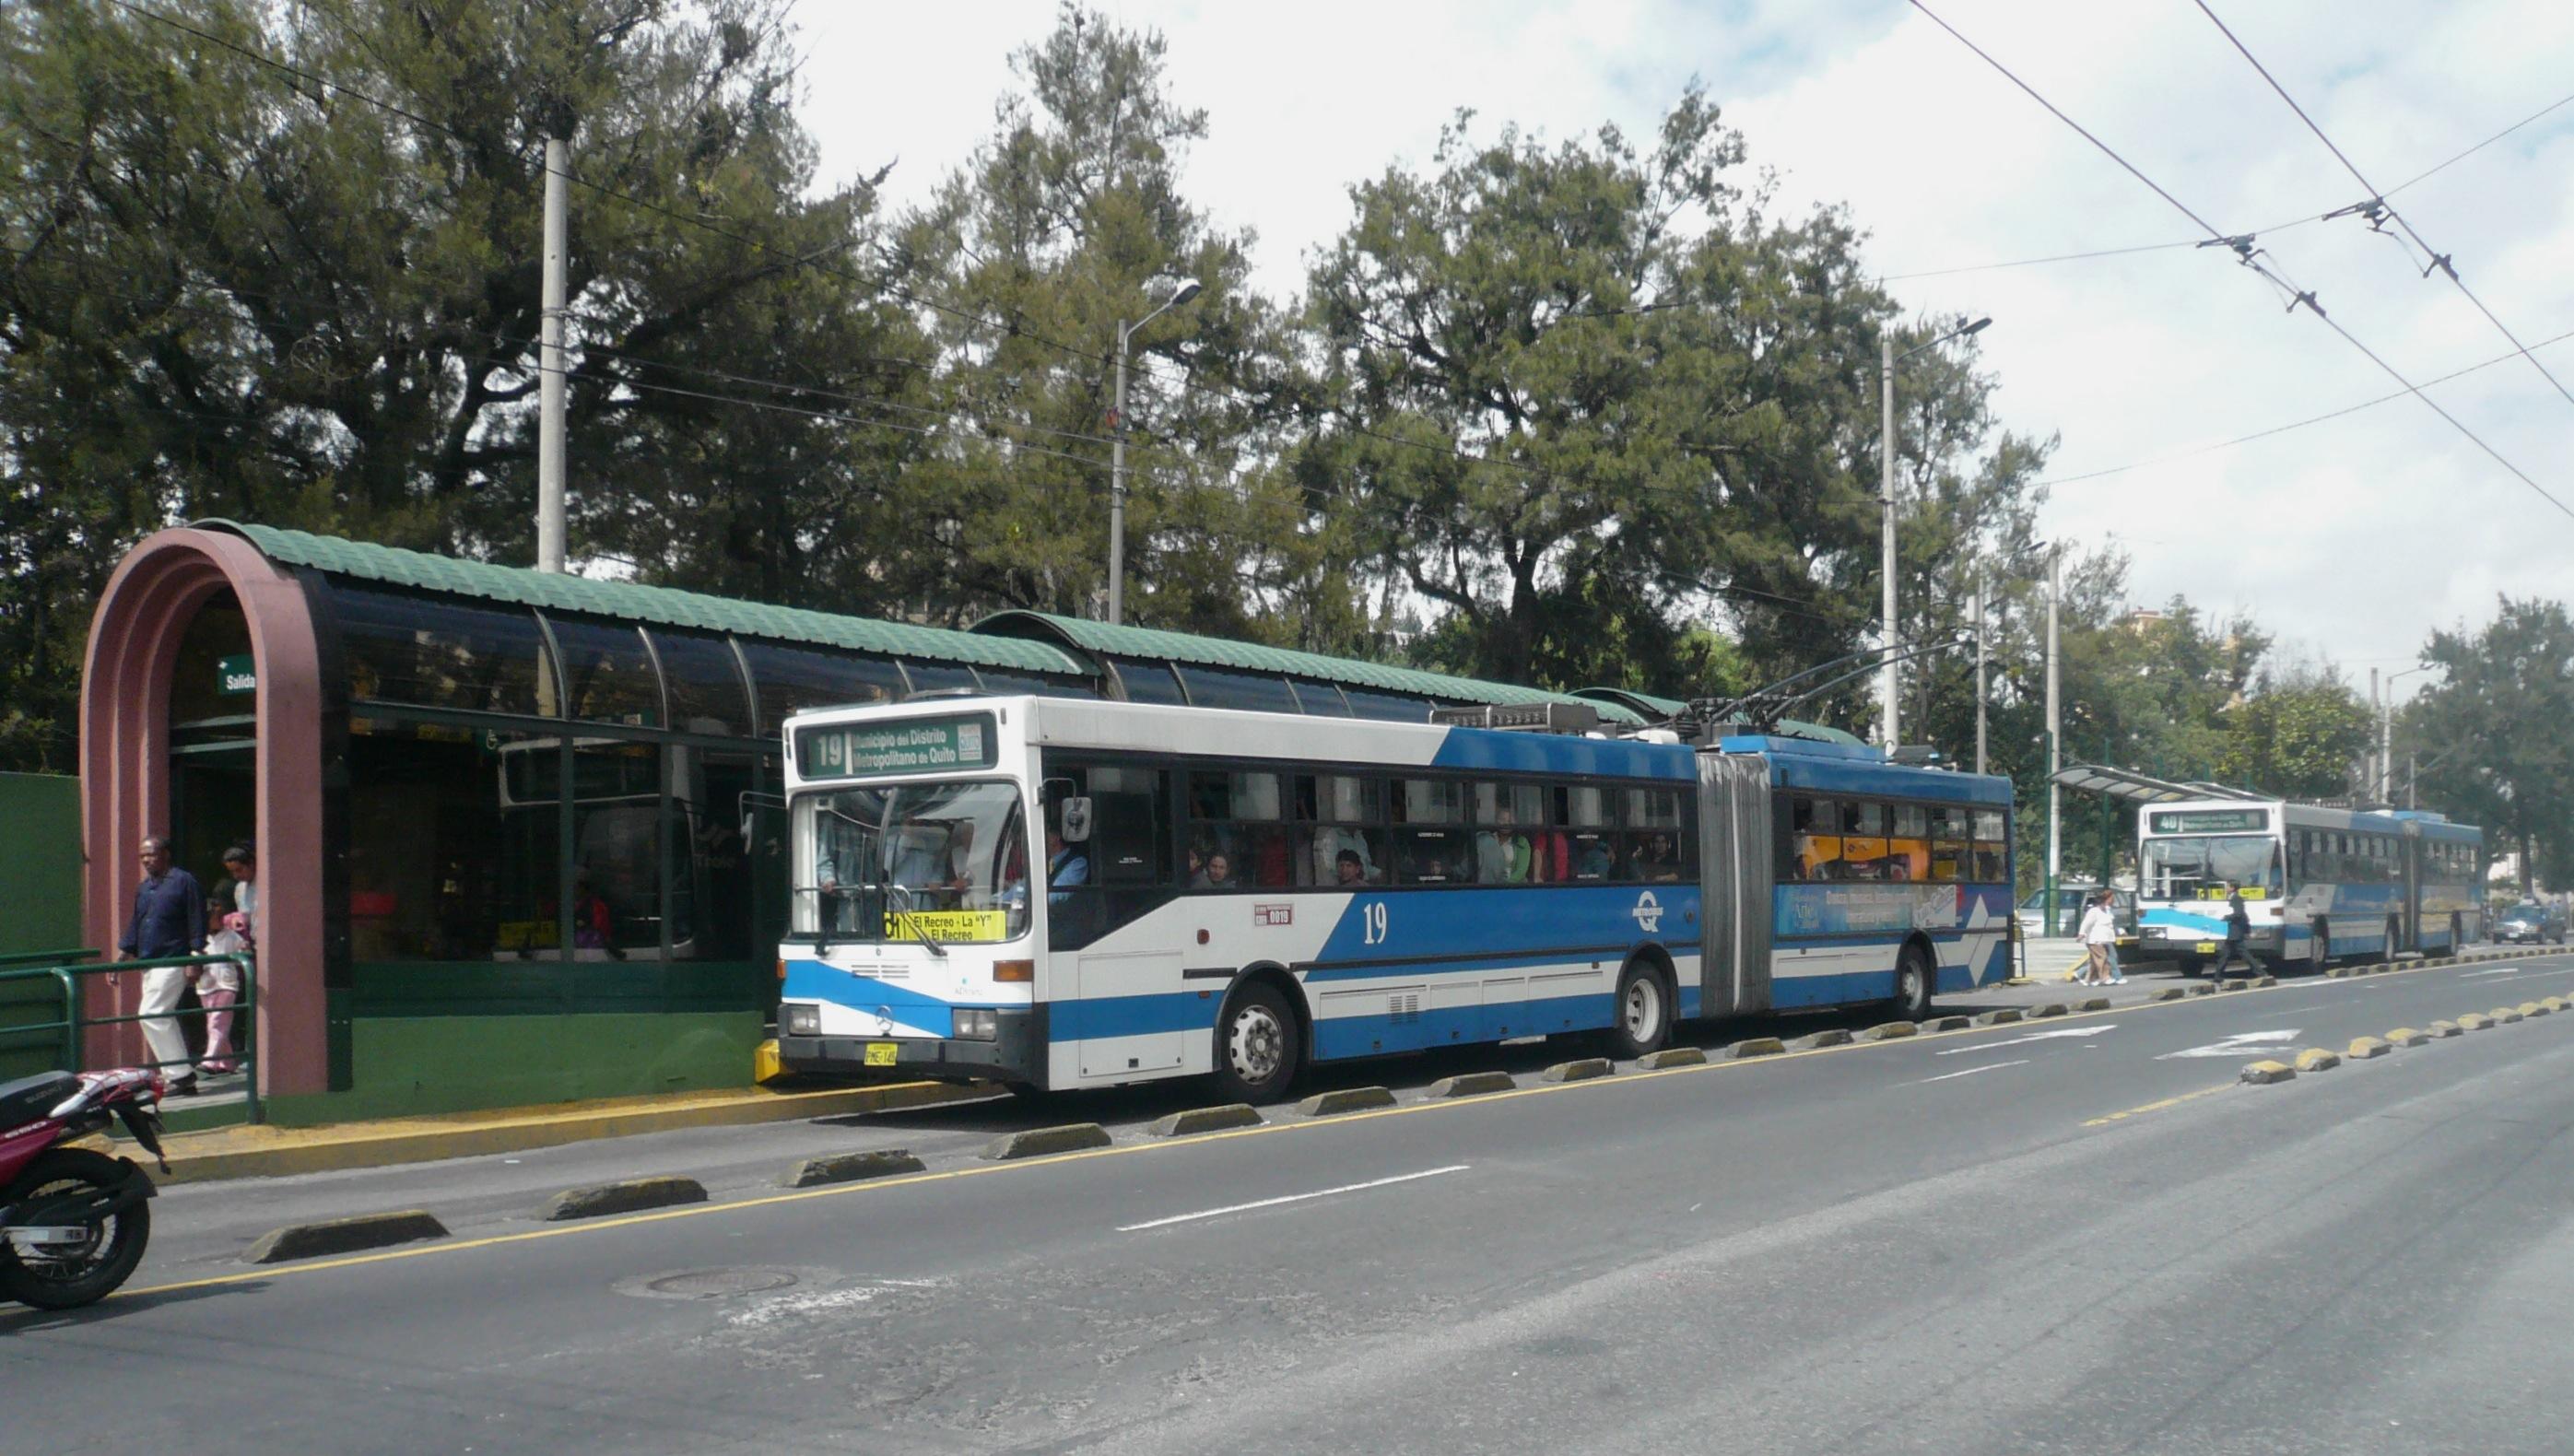 Quito Şehir İçi Ulaşım